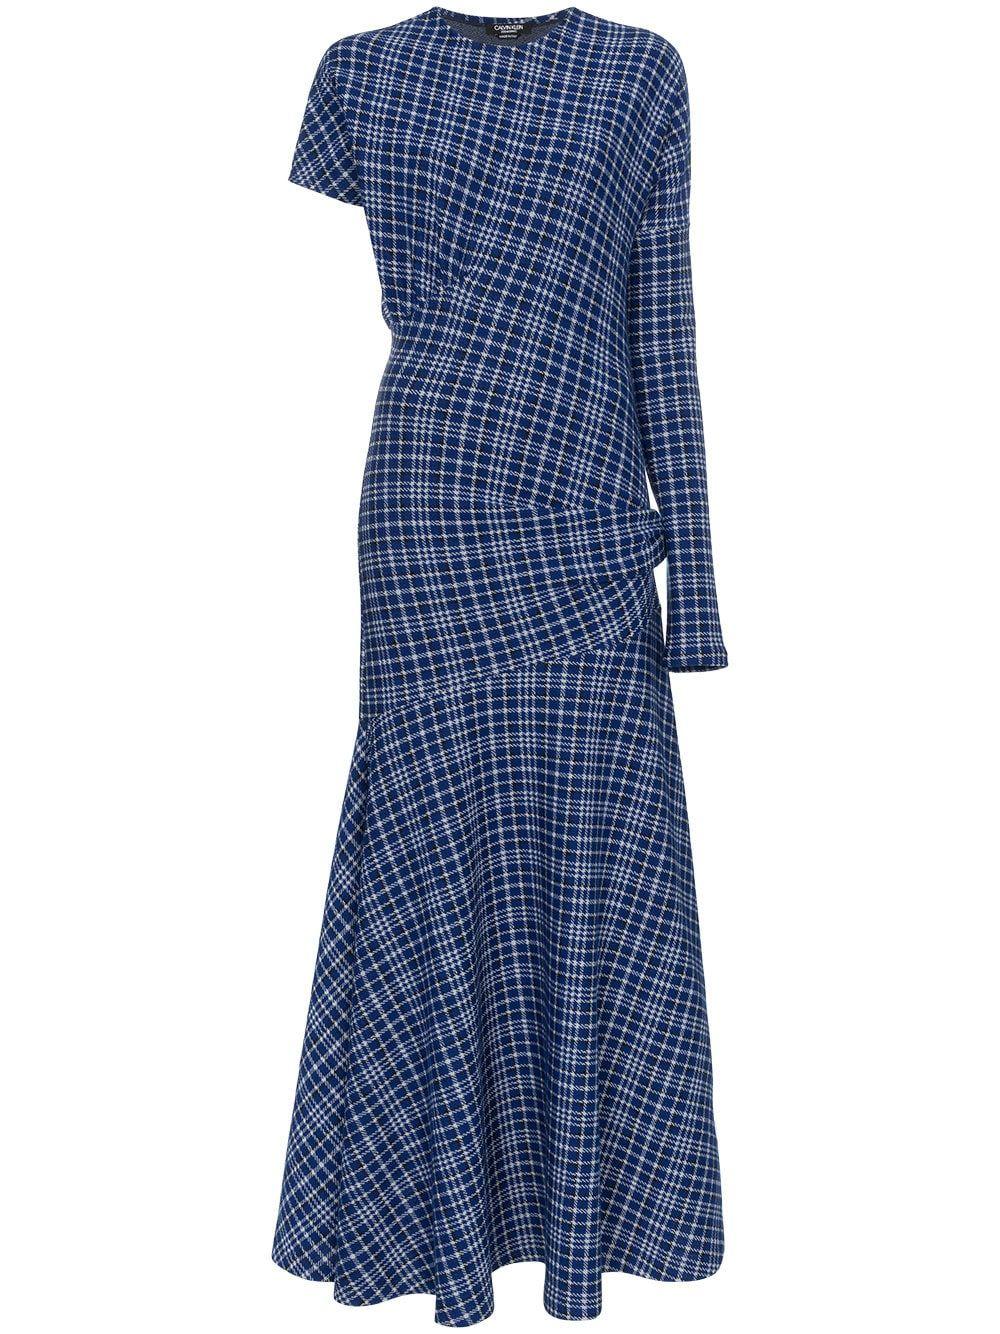 20a26bf3c6 Calvin Klein 205W39nyc single sleeve check asymmetric dress ...